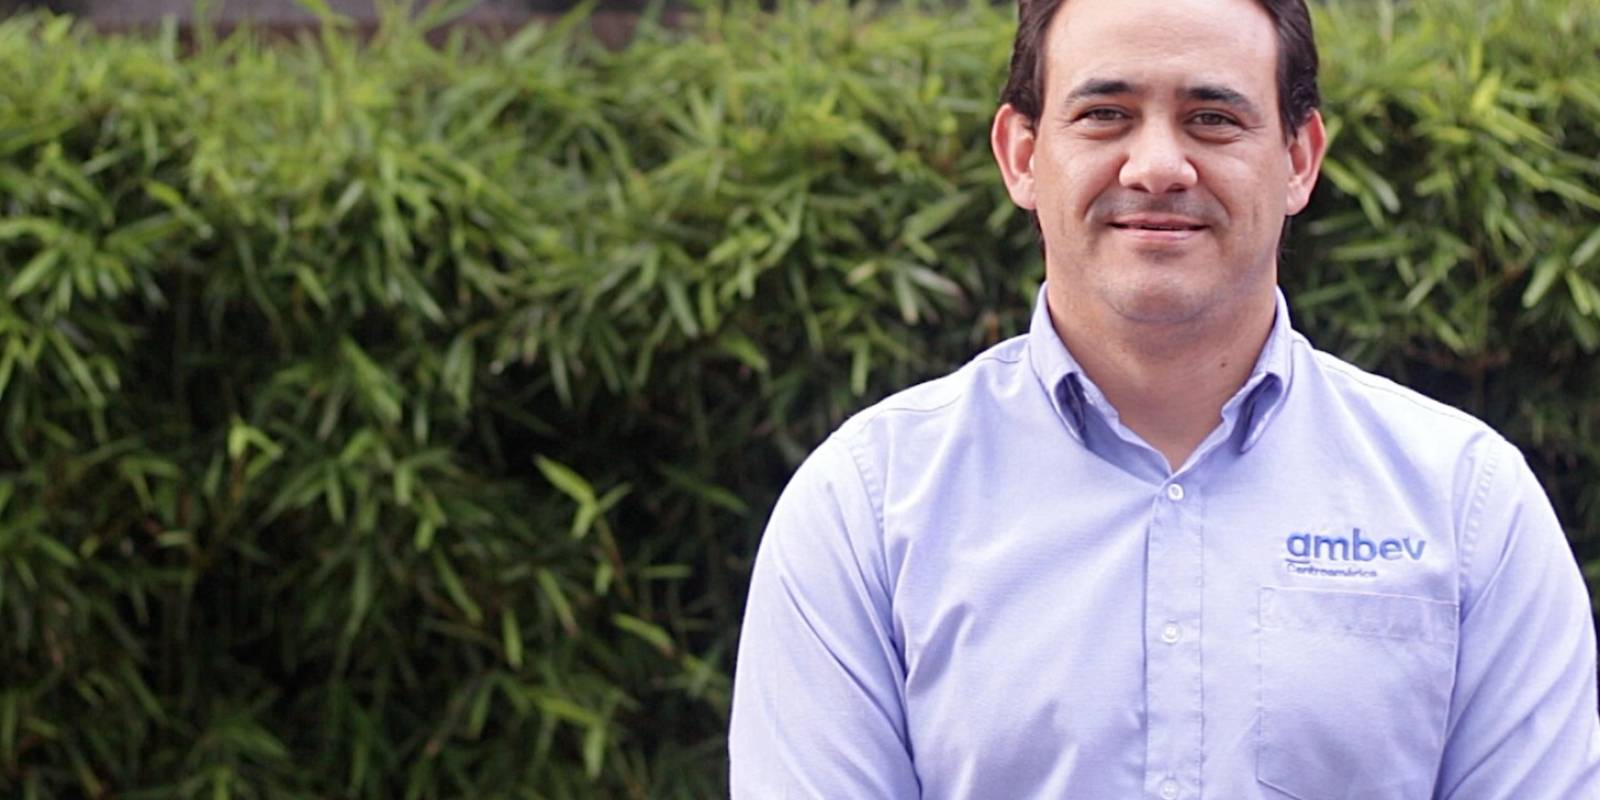 Roberto Batres, gerente de Asuntos Corporativos de Ambev Centroamérica